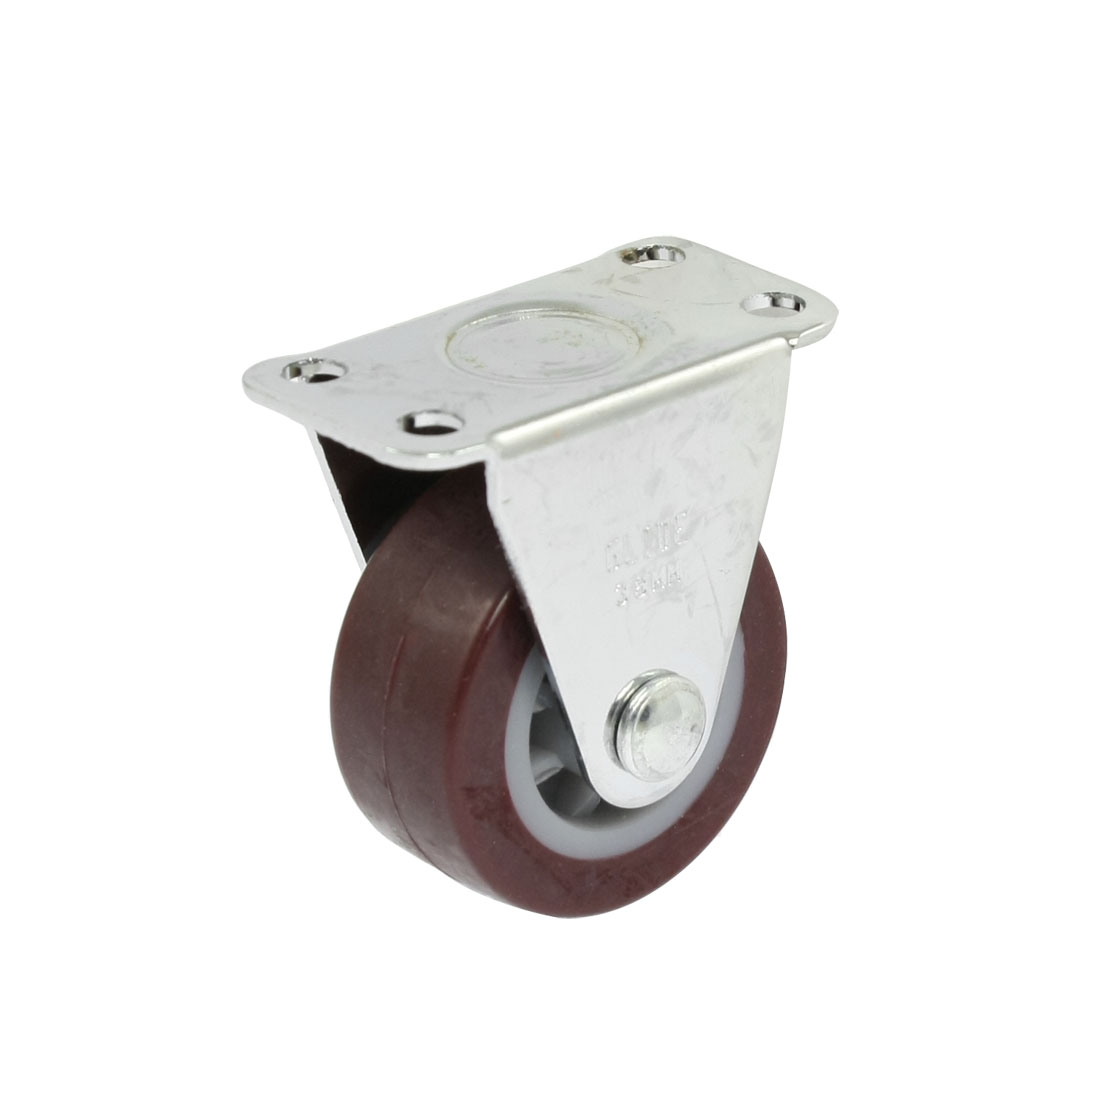 "Trolley Silver Tone Plate 1.4"" Single Burgundy White Wheel Rigid Cast"